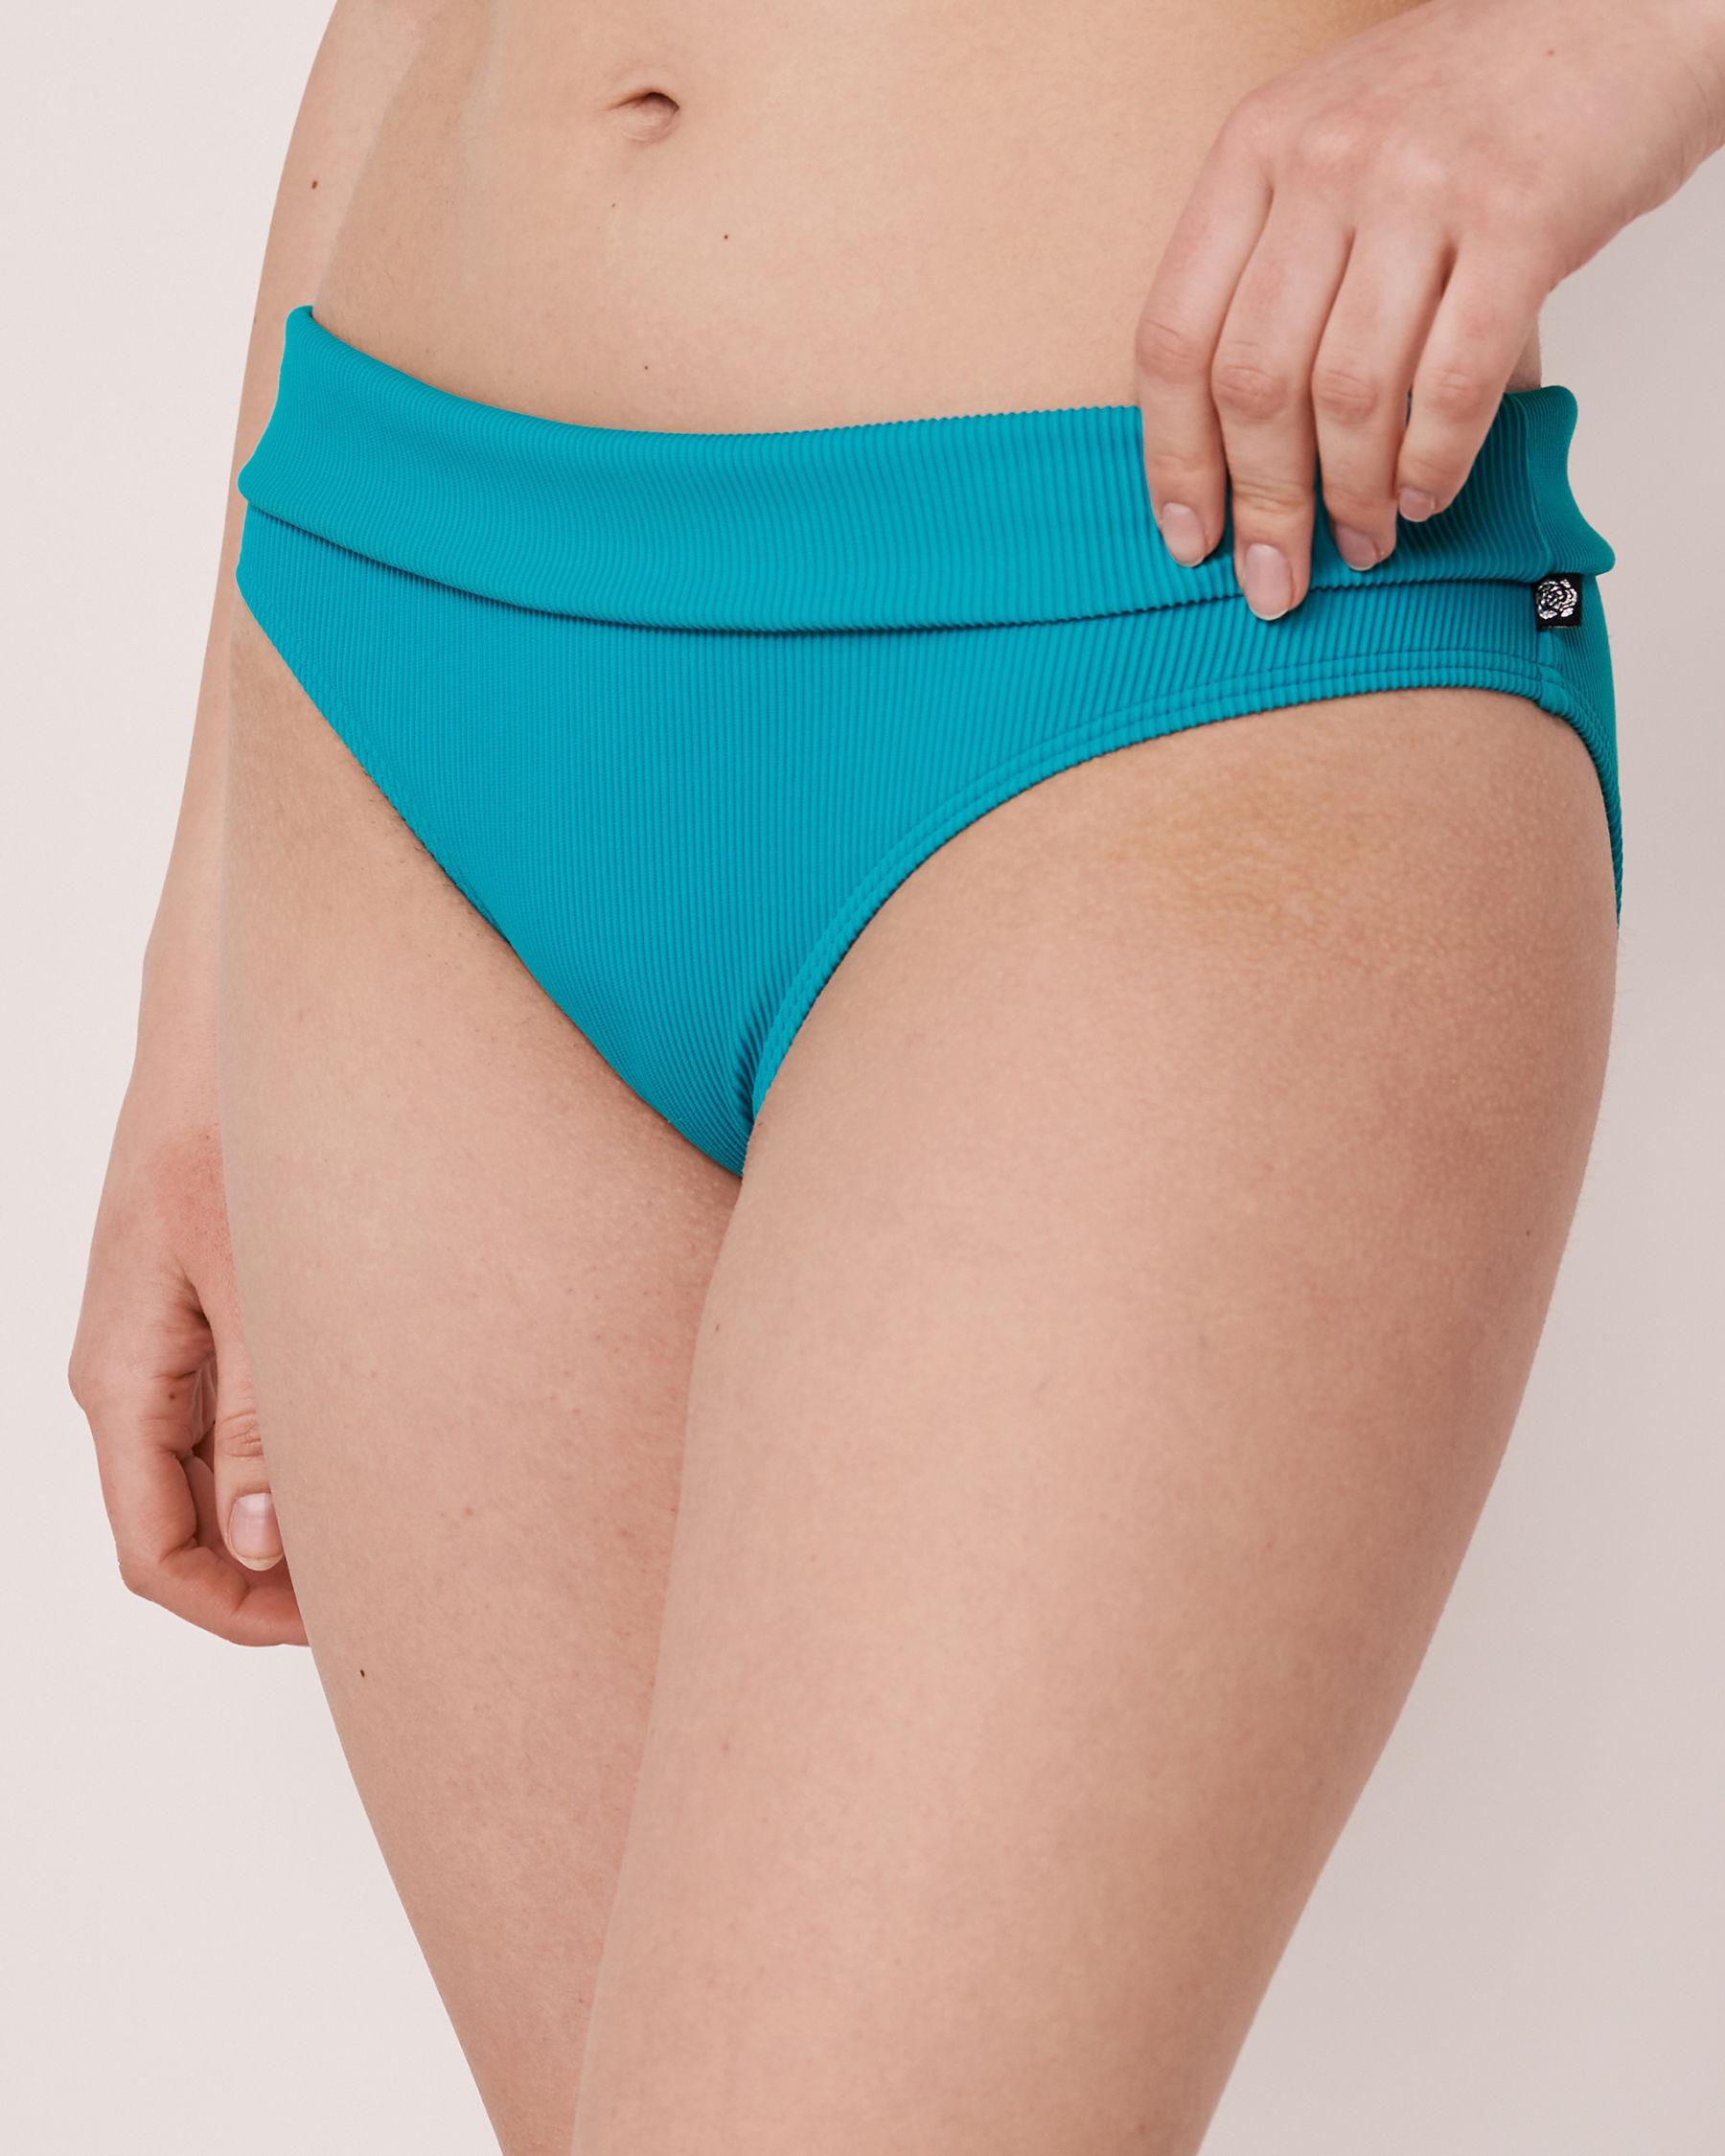 LA VIE EN ROSE AQUA Bas de bikini bande de taille pliable en fibres recyclées TOOTSIE RIB Bleu 70300063 - Voir1